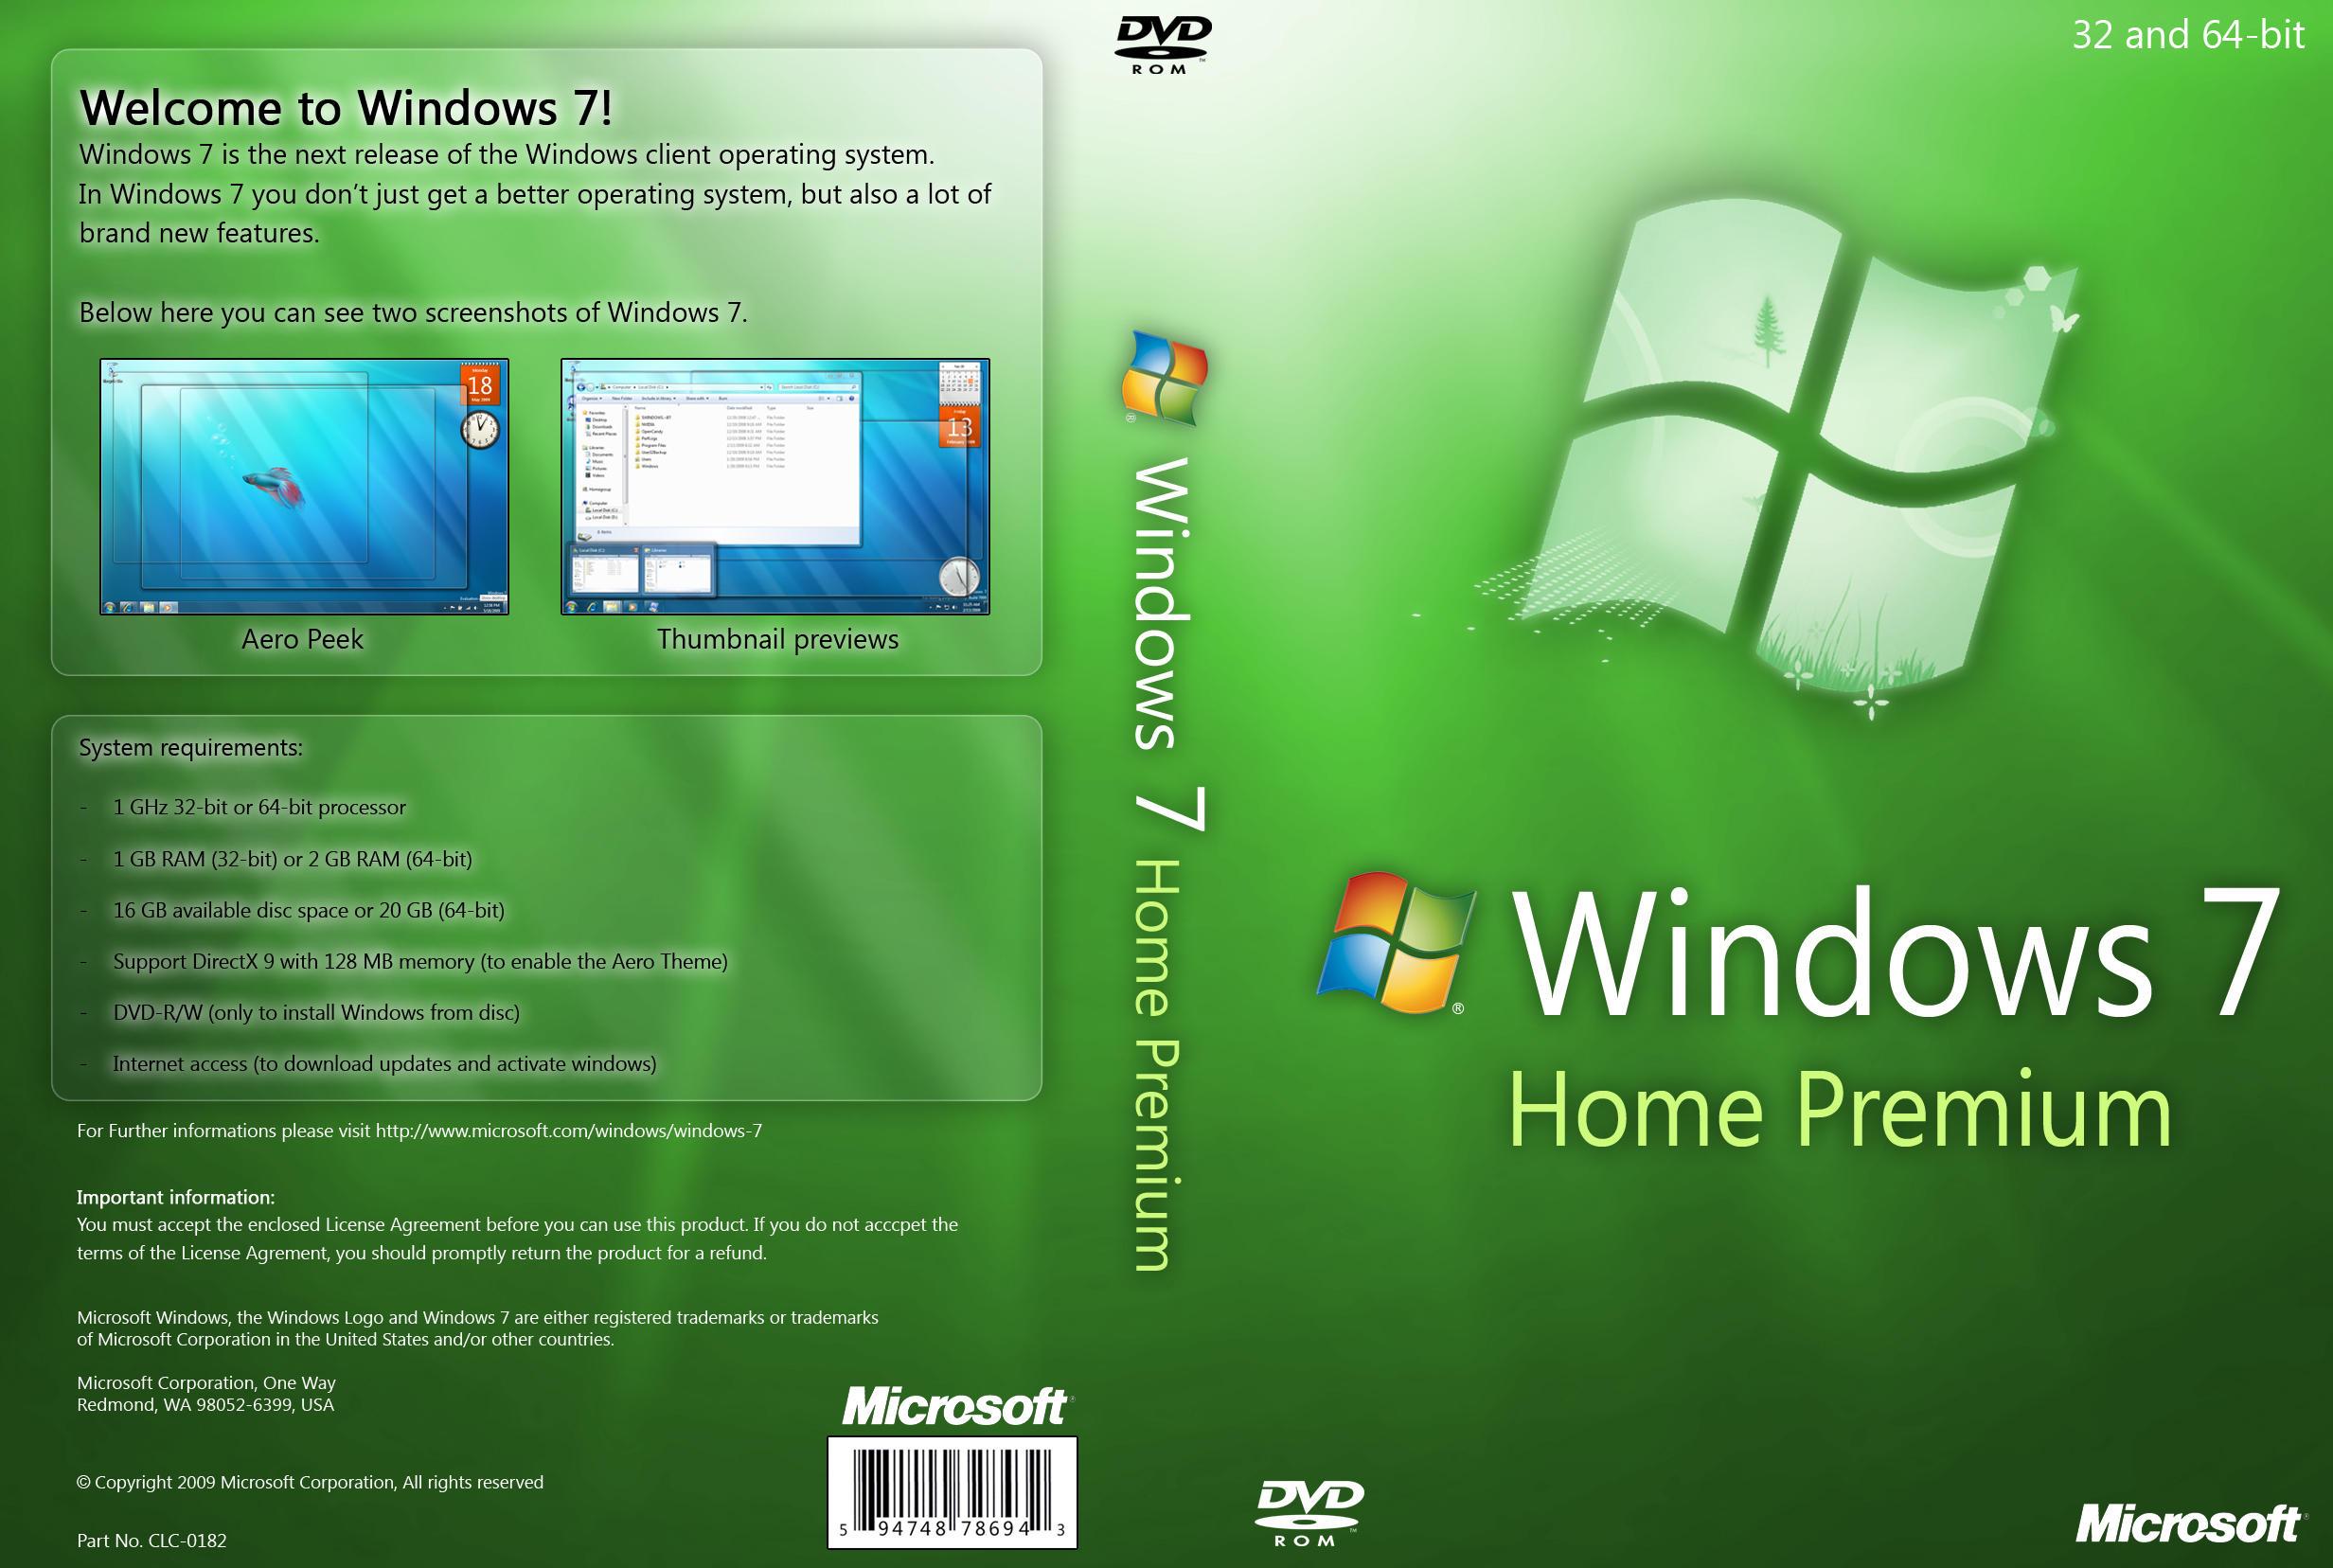 Windows Movie Maker Win 7 Home Premium